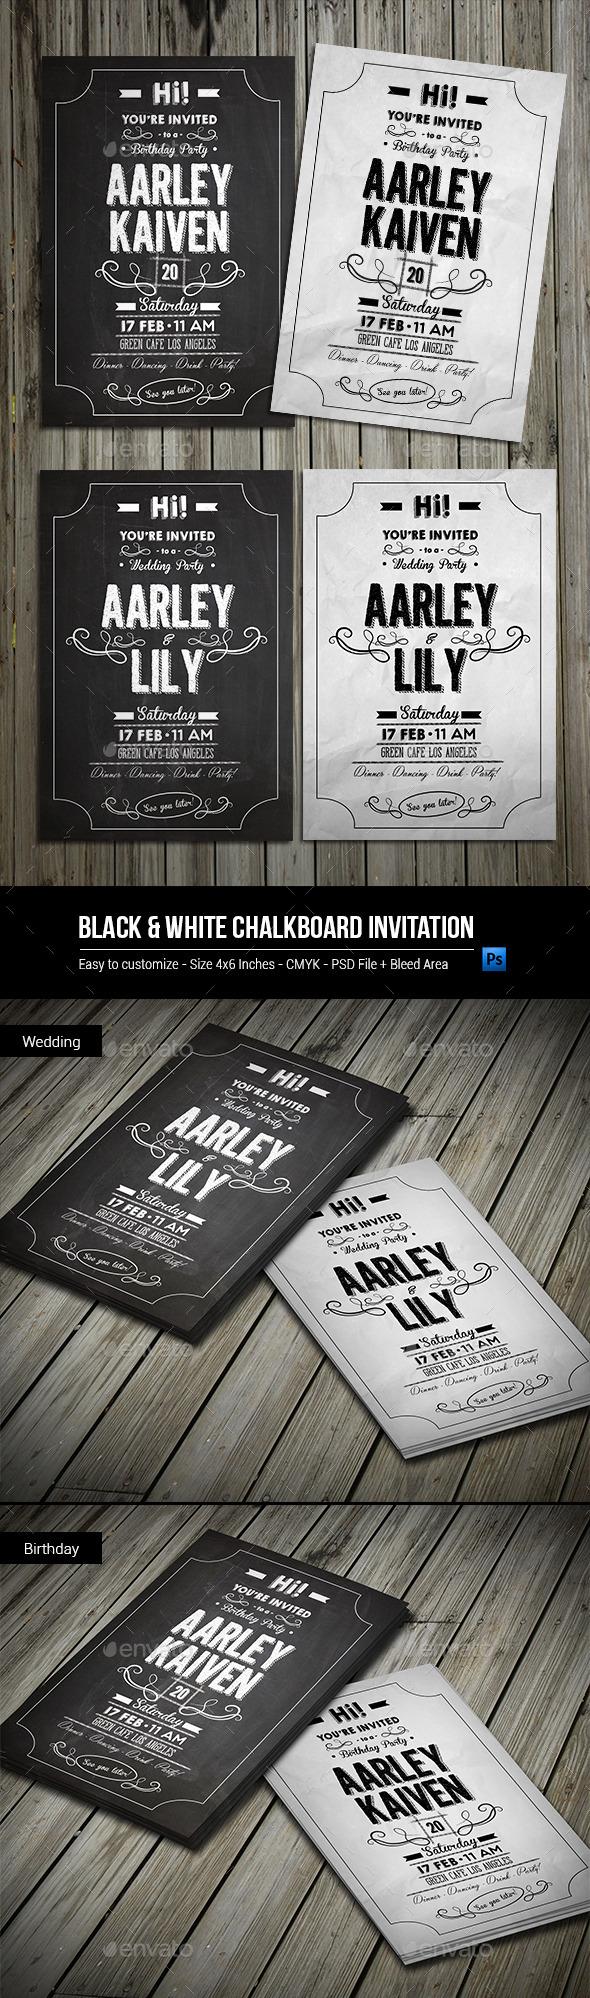 Black & White Chalkboard Invitation - Invitations Cards & Invites